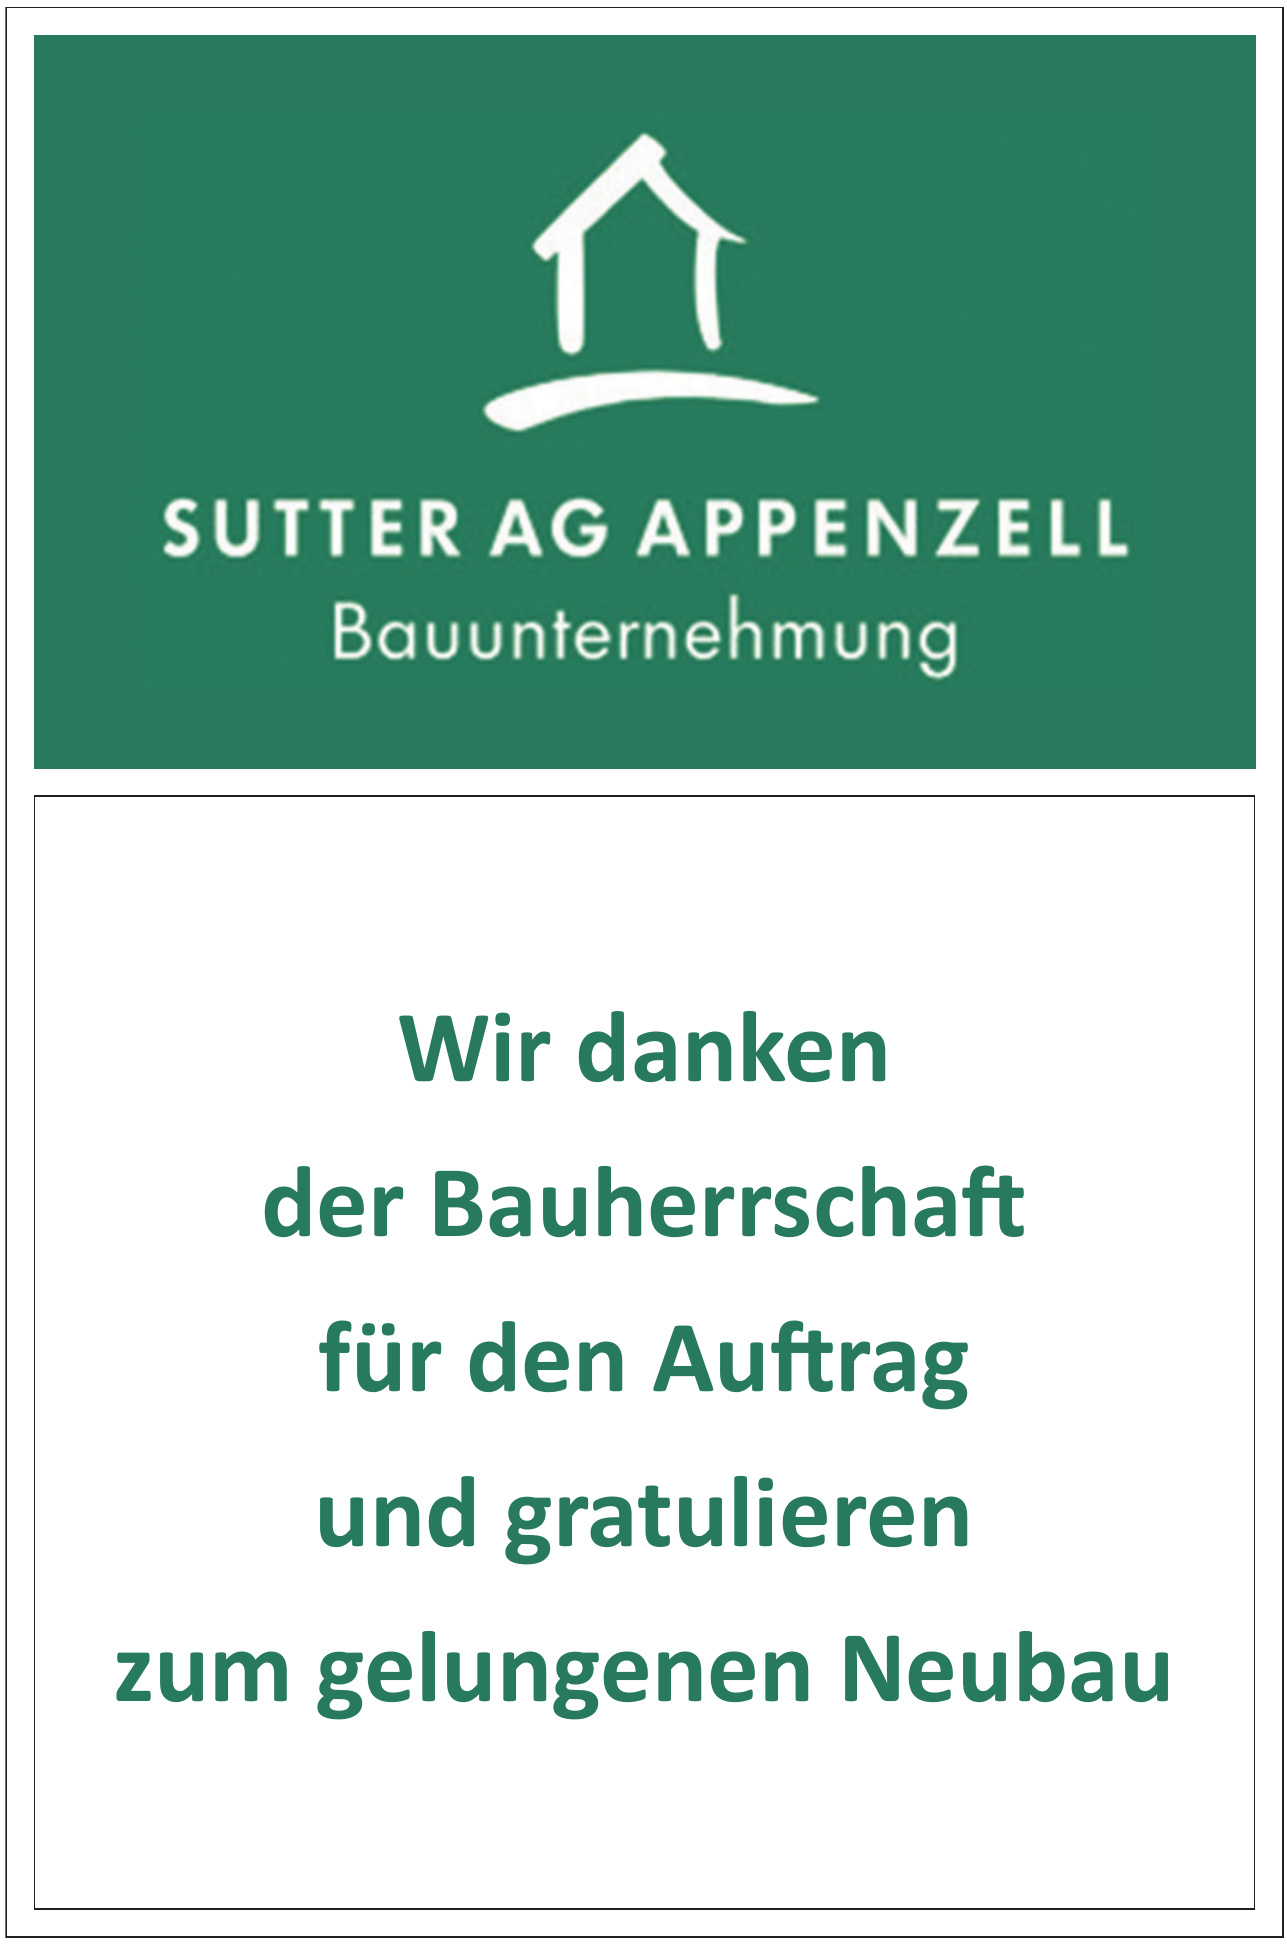 Sutter AG Appenzell Bauunternehmung